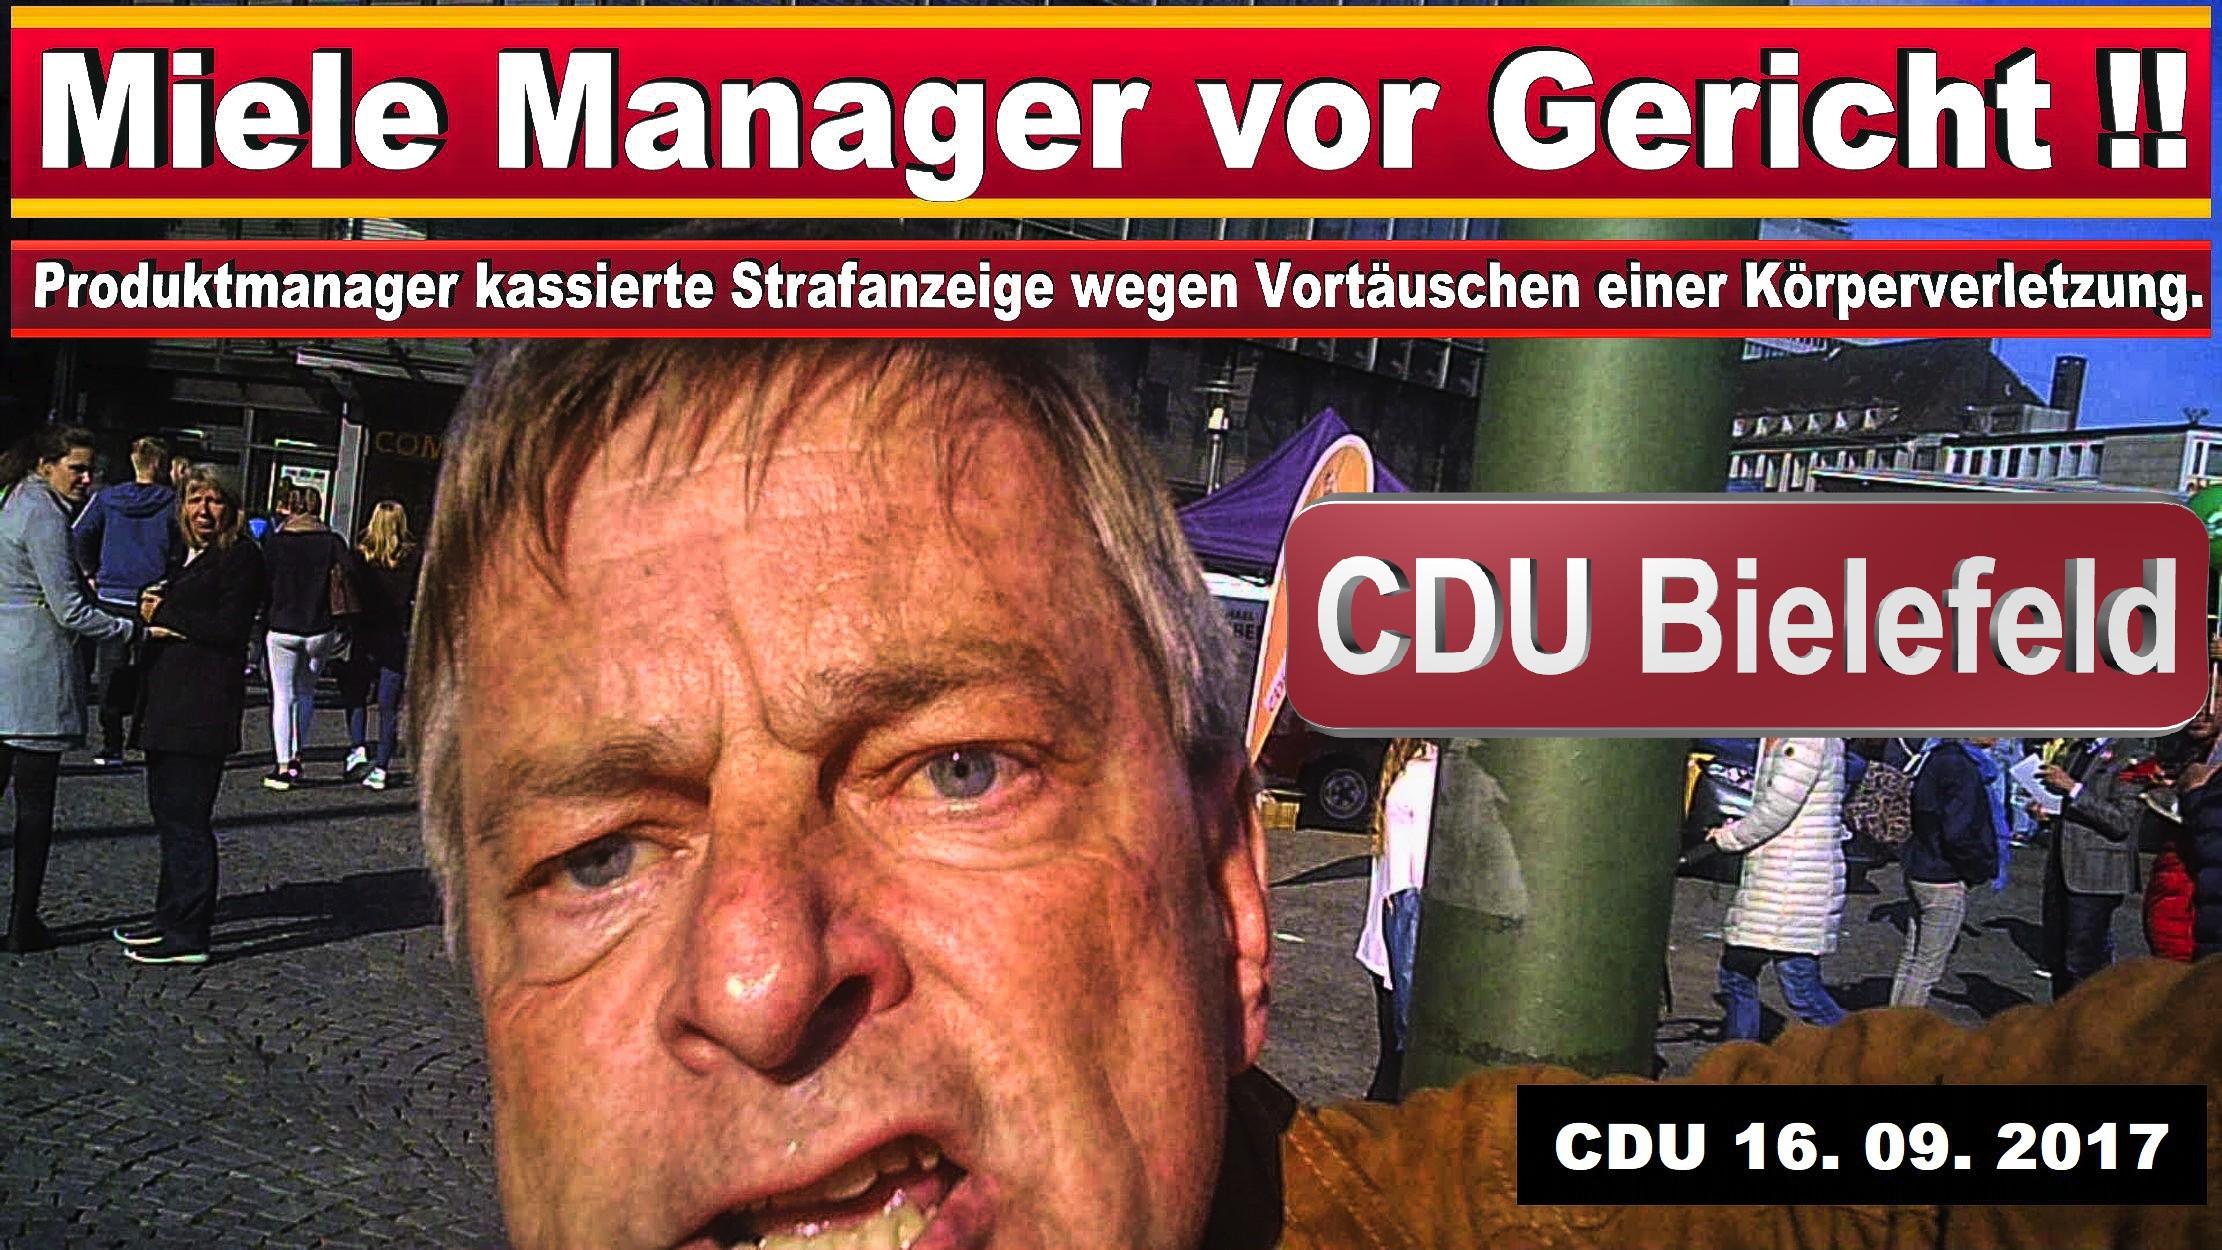 CDU POLITIKER BIELEFELD MICHAEL WEBER MIELE GüTERSLOH PRODUKTMANAGER JURIST SPD FDP AFD BIELEFELD